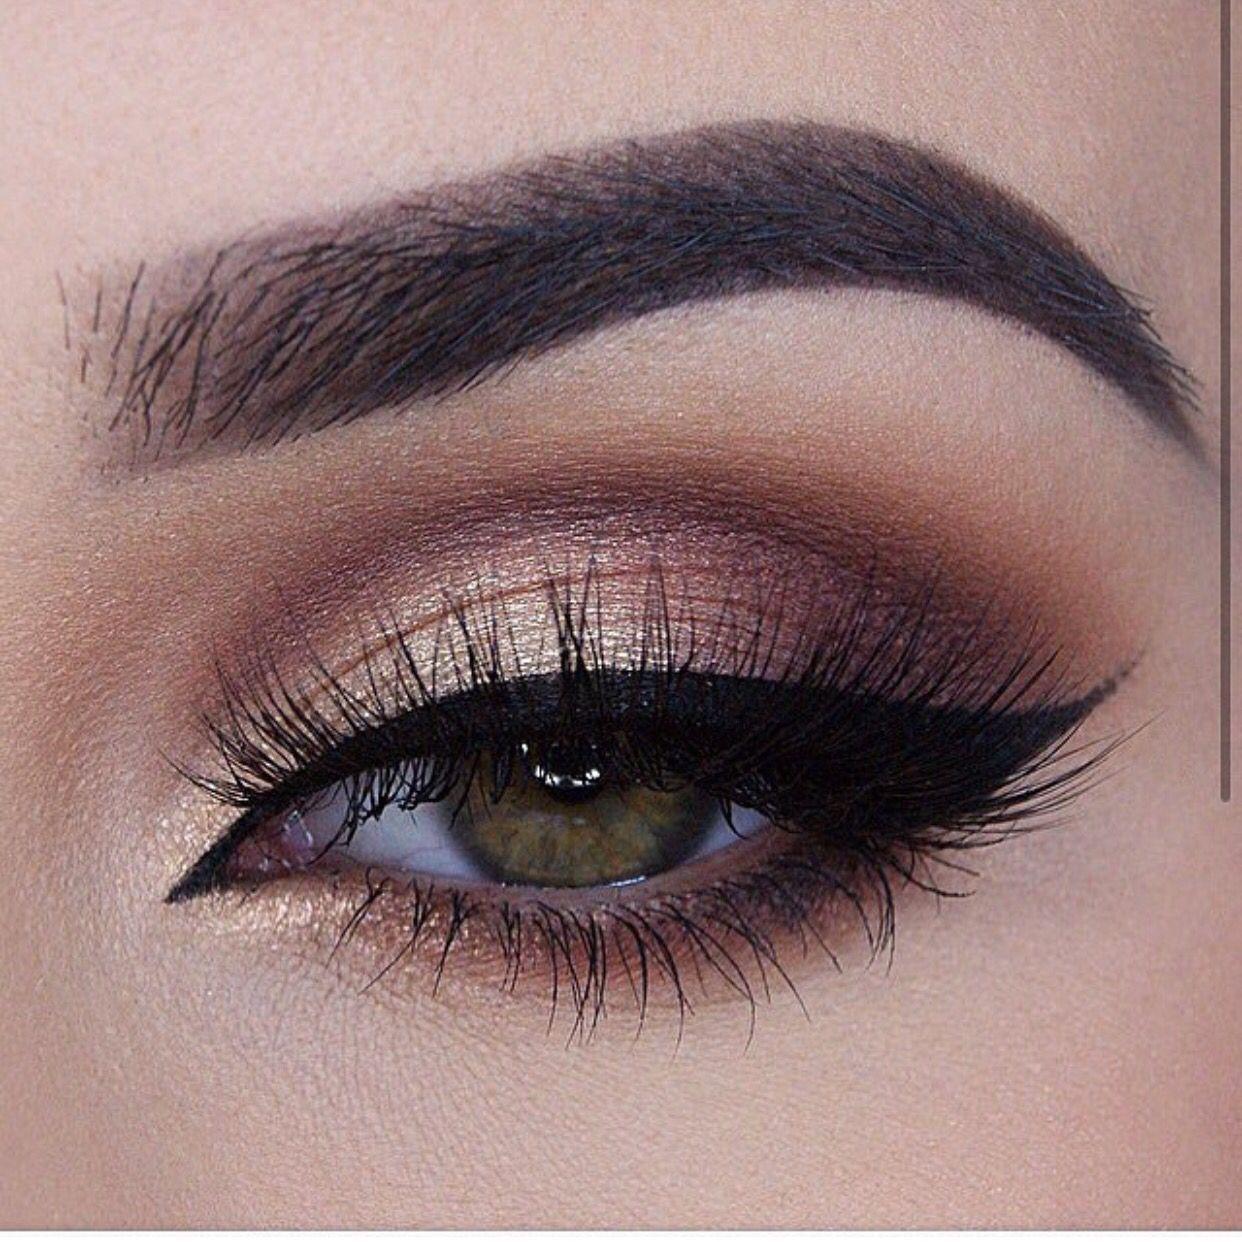 pin by sarah potter on make up | pinterest | makeup, eye makeup and